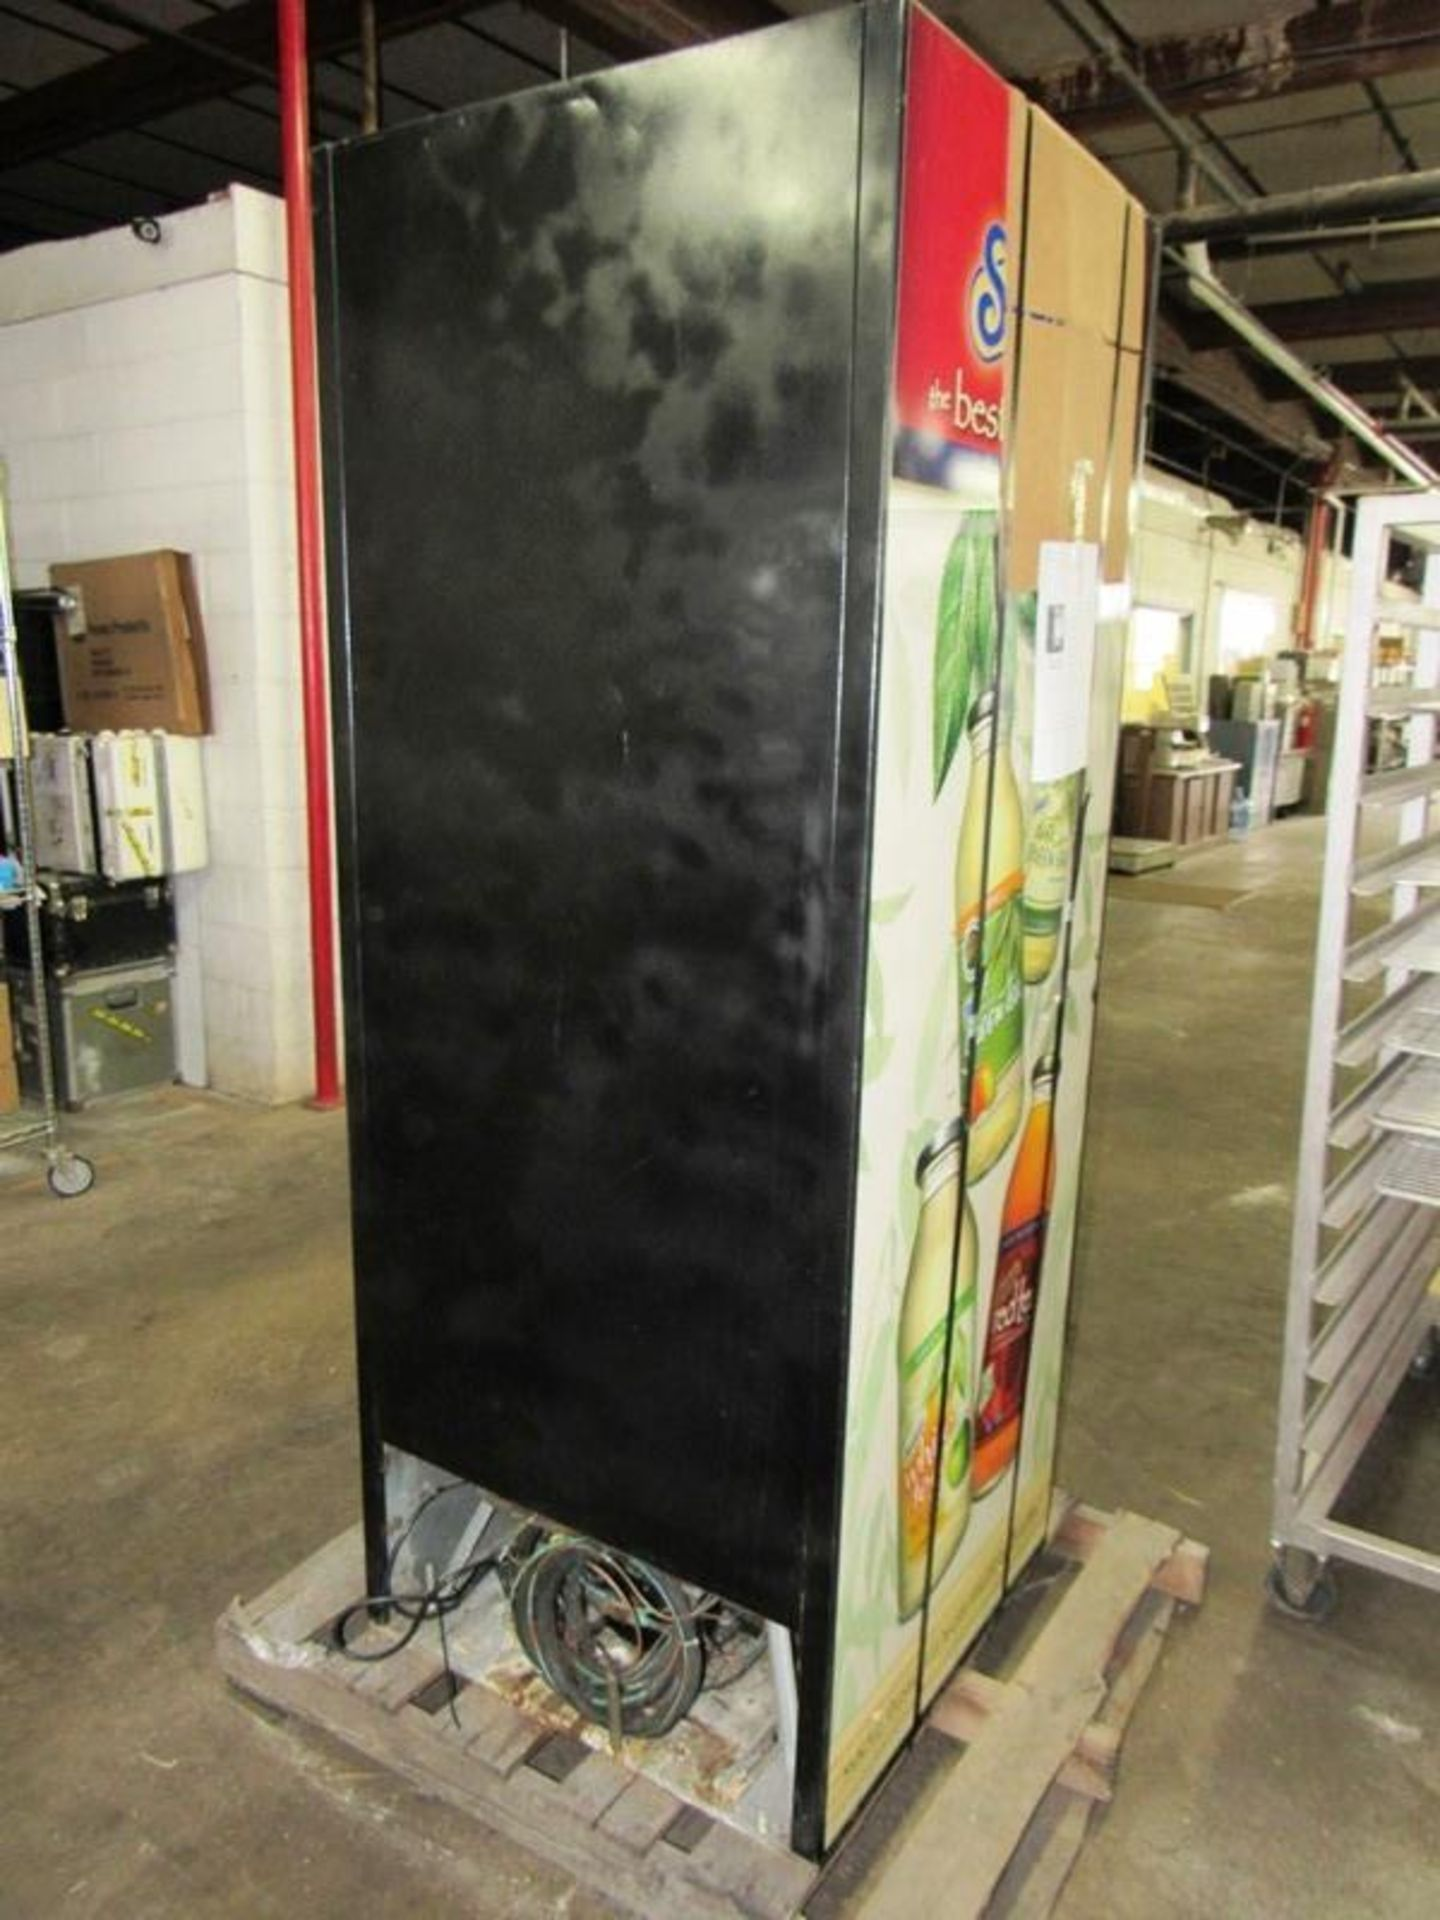 Beverage Air Mdl. MT-27 Refrigerator and/or Freezer, 4 shelves, single door, 27 cu. ft., 30 W X - Image 3 of 4